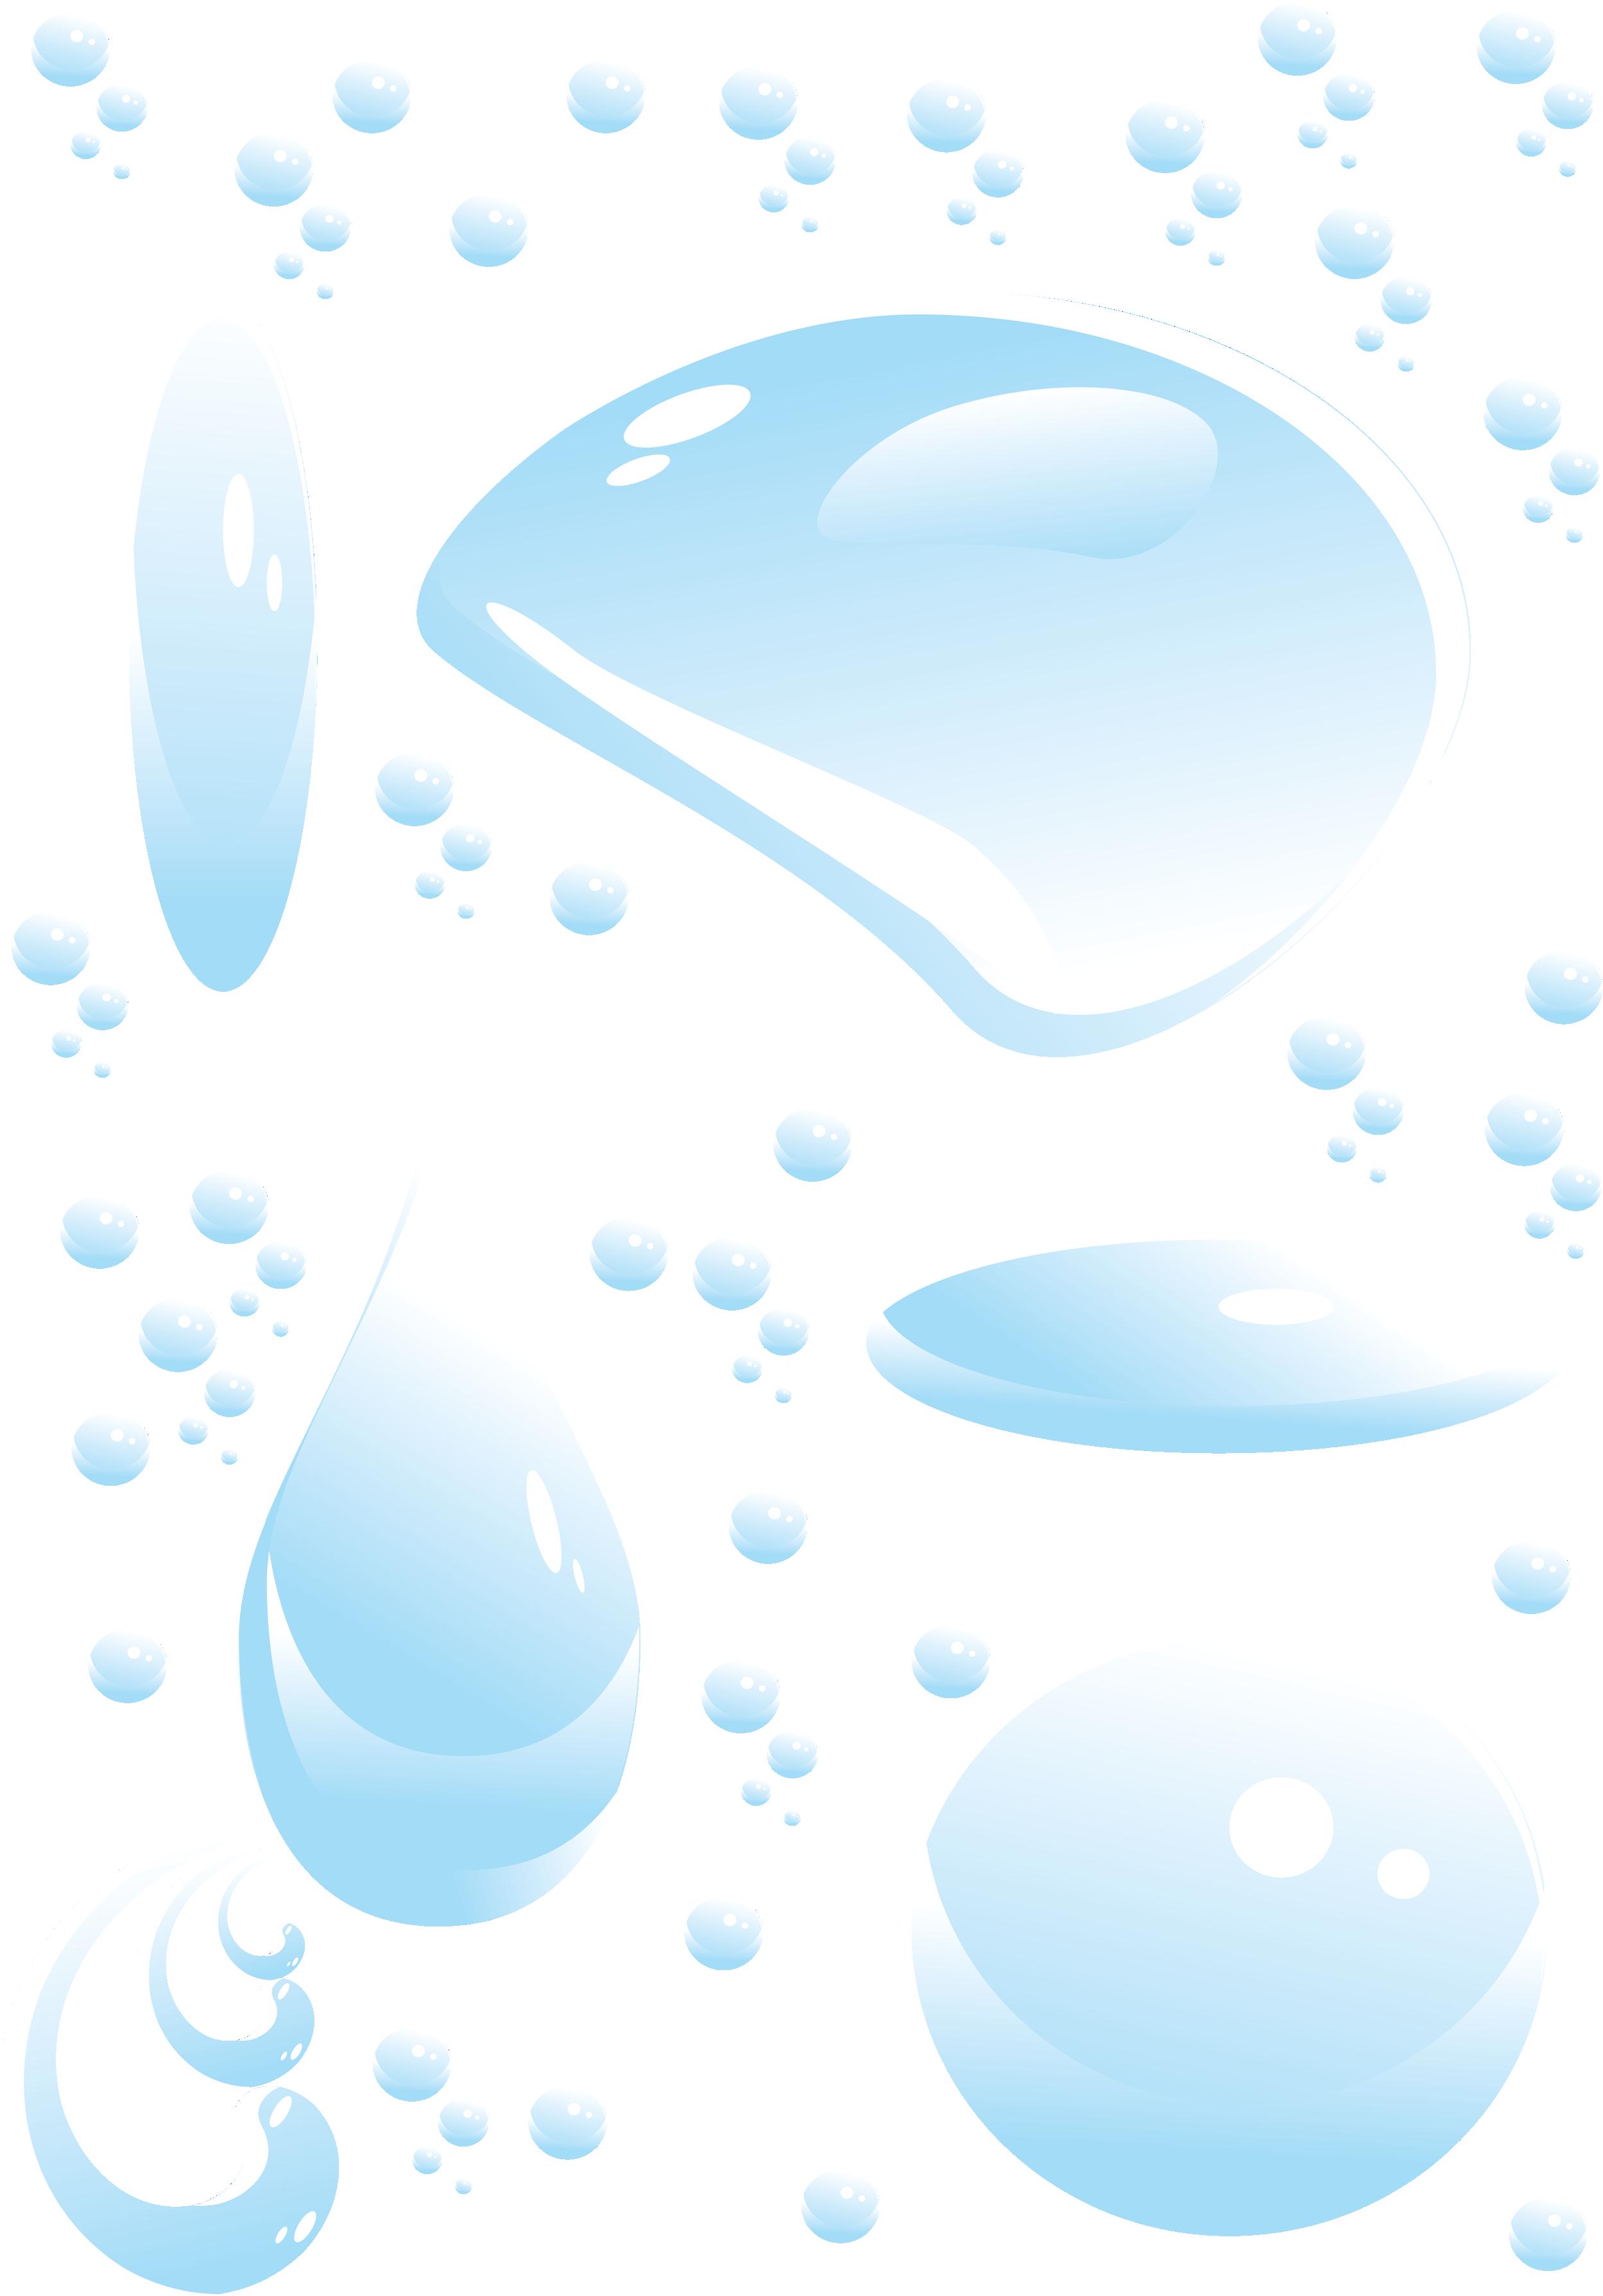 Water Drops PNG Image   Water Drops PNG Image image #754